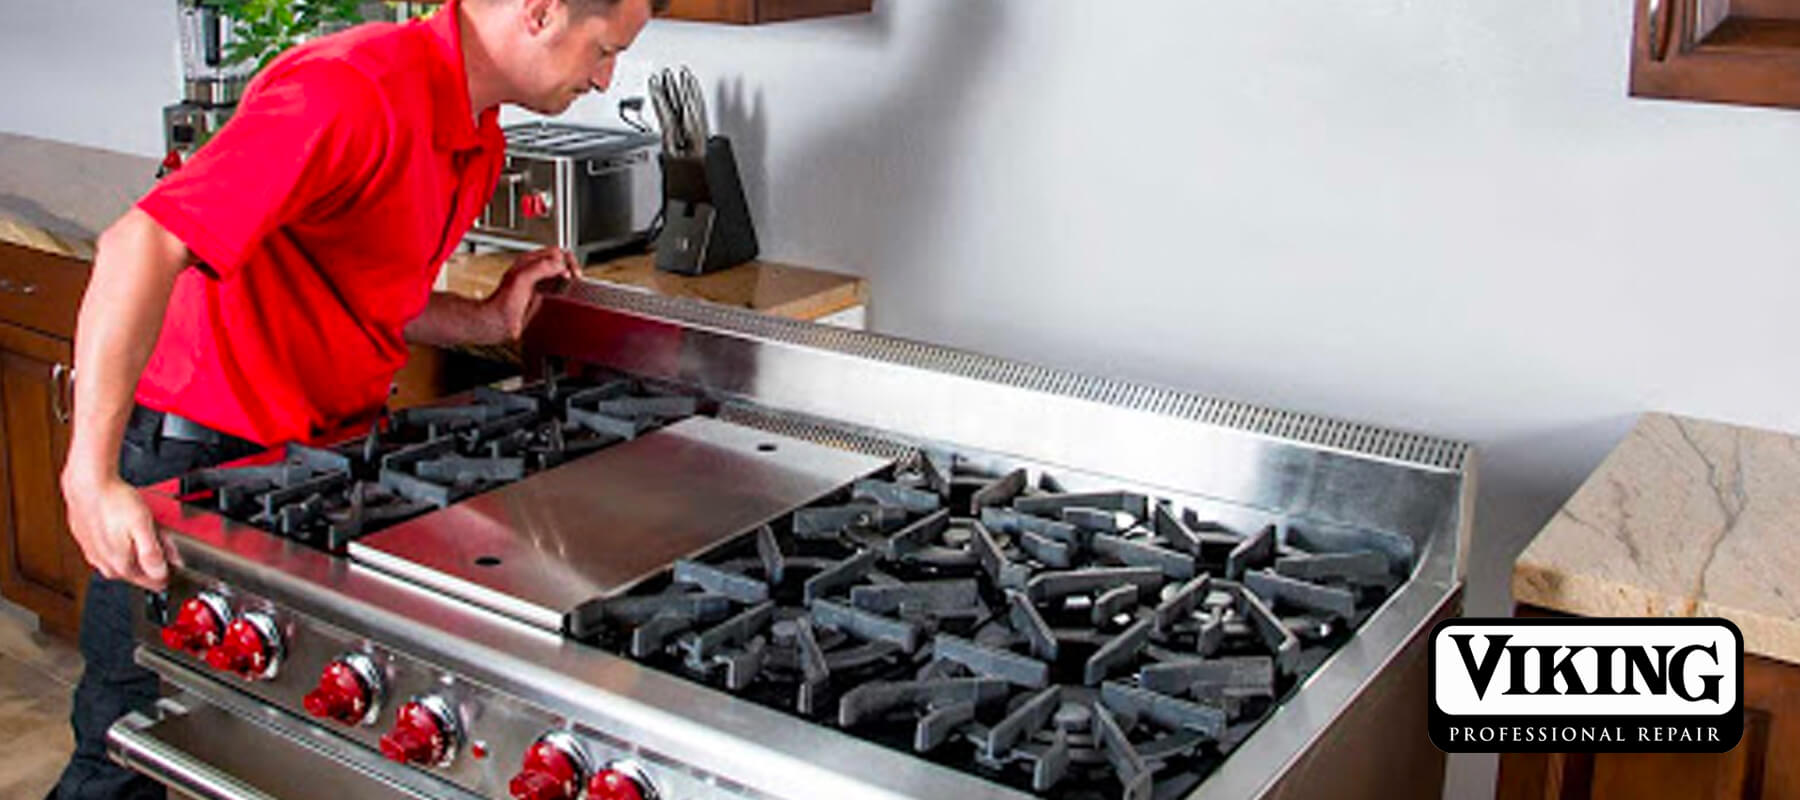 Authorized Viking Appliance Repair Service Oakland | Professional Viking Repair